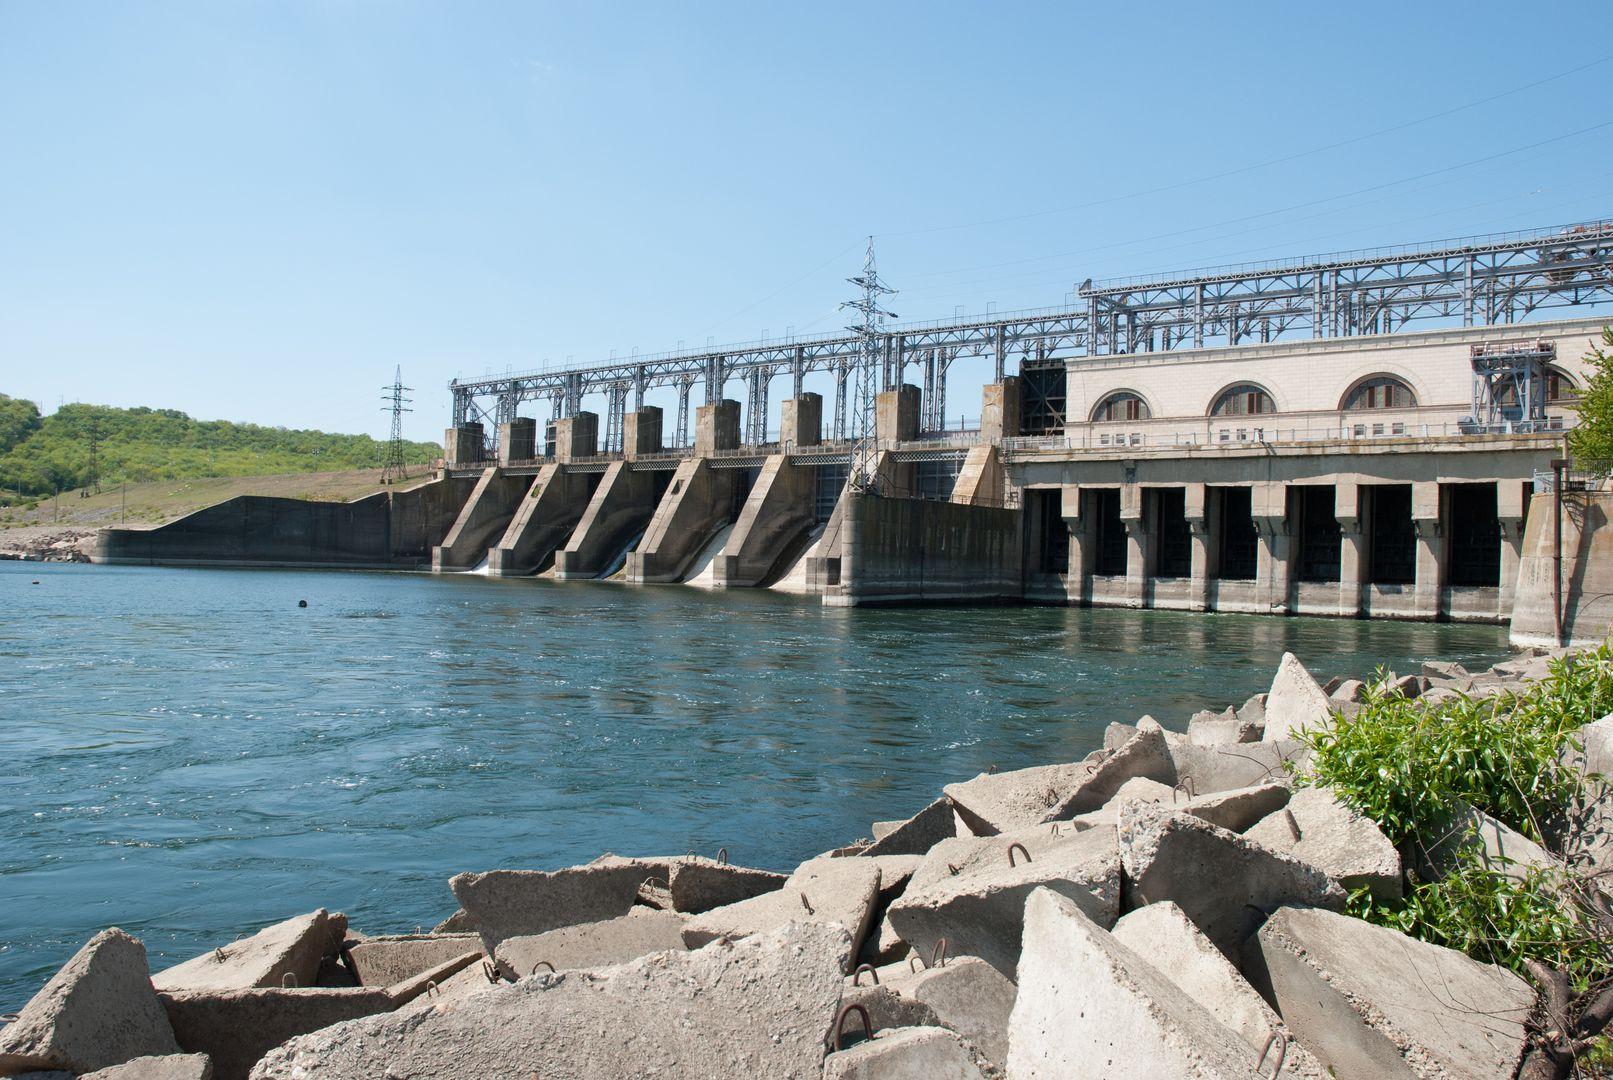 Dubossary hydropower plant